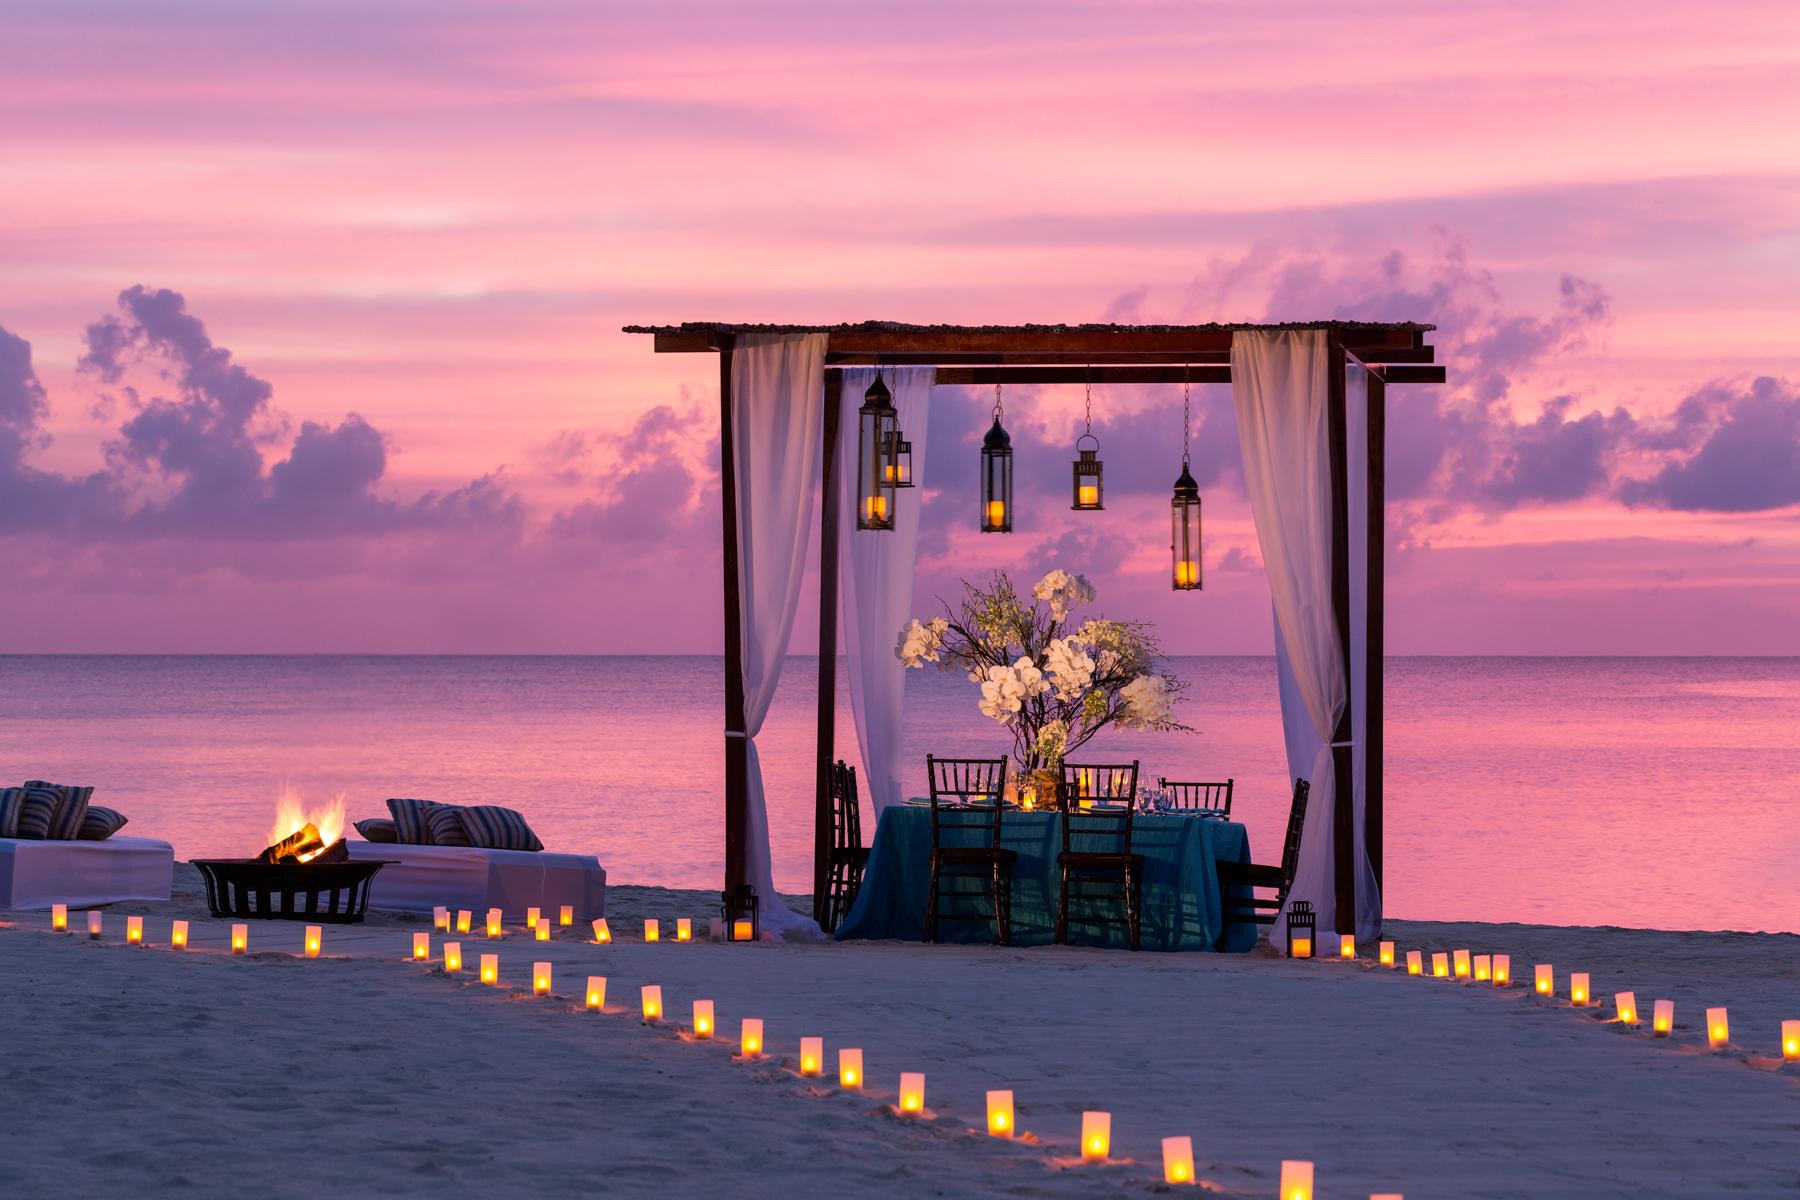 rcgc_beach_prvt_dinner001_1.jpg